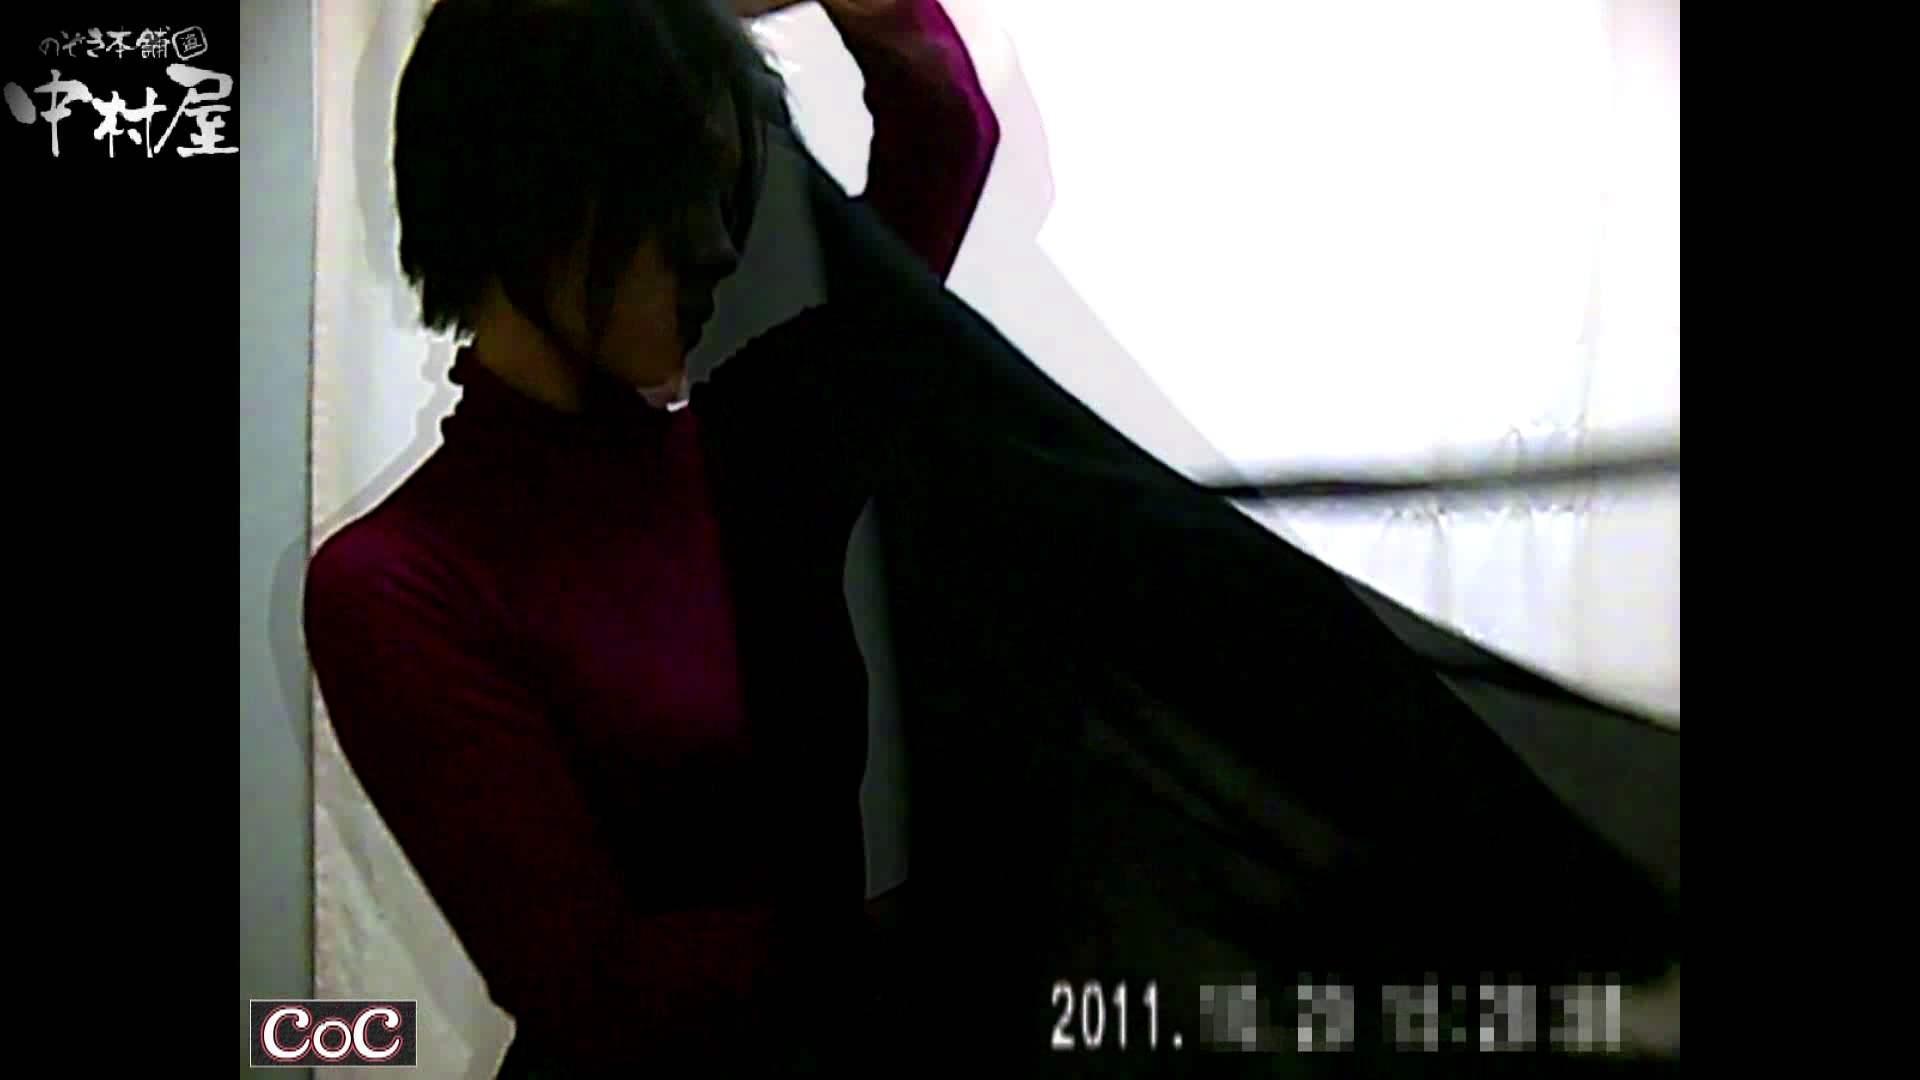 Doctor-X元医者による反抗vol.65 おまんこ見放題 | 盗撮シリーズ  102PIX 15